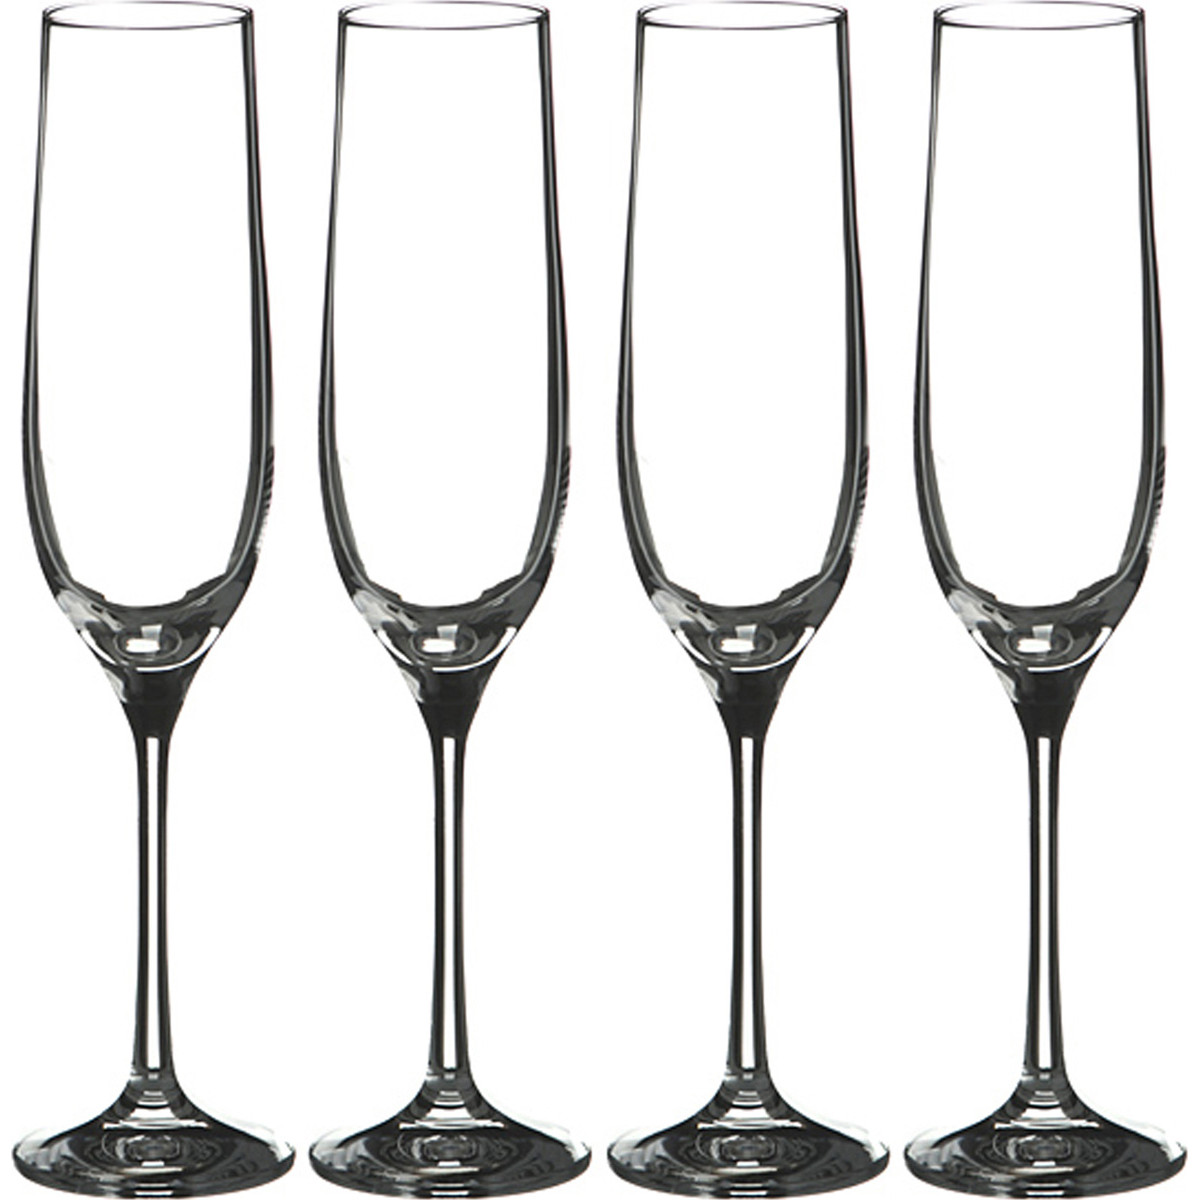 {} Bohemia Crystal Набор бокалов для шампанского Cora (24 см - 4 шт) bohemia crystal набор бокалов для шампанского felina 25 см 2 шт